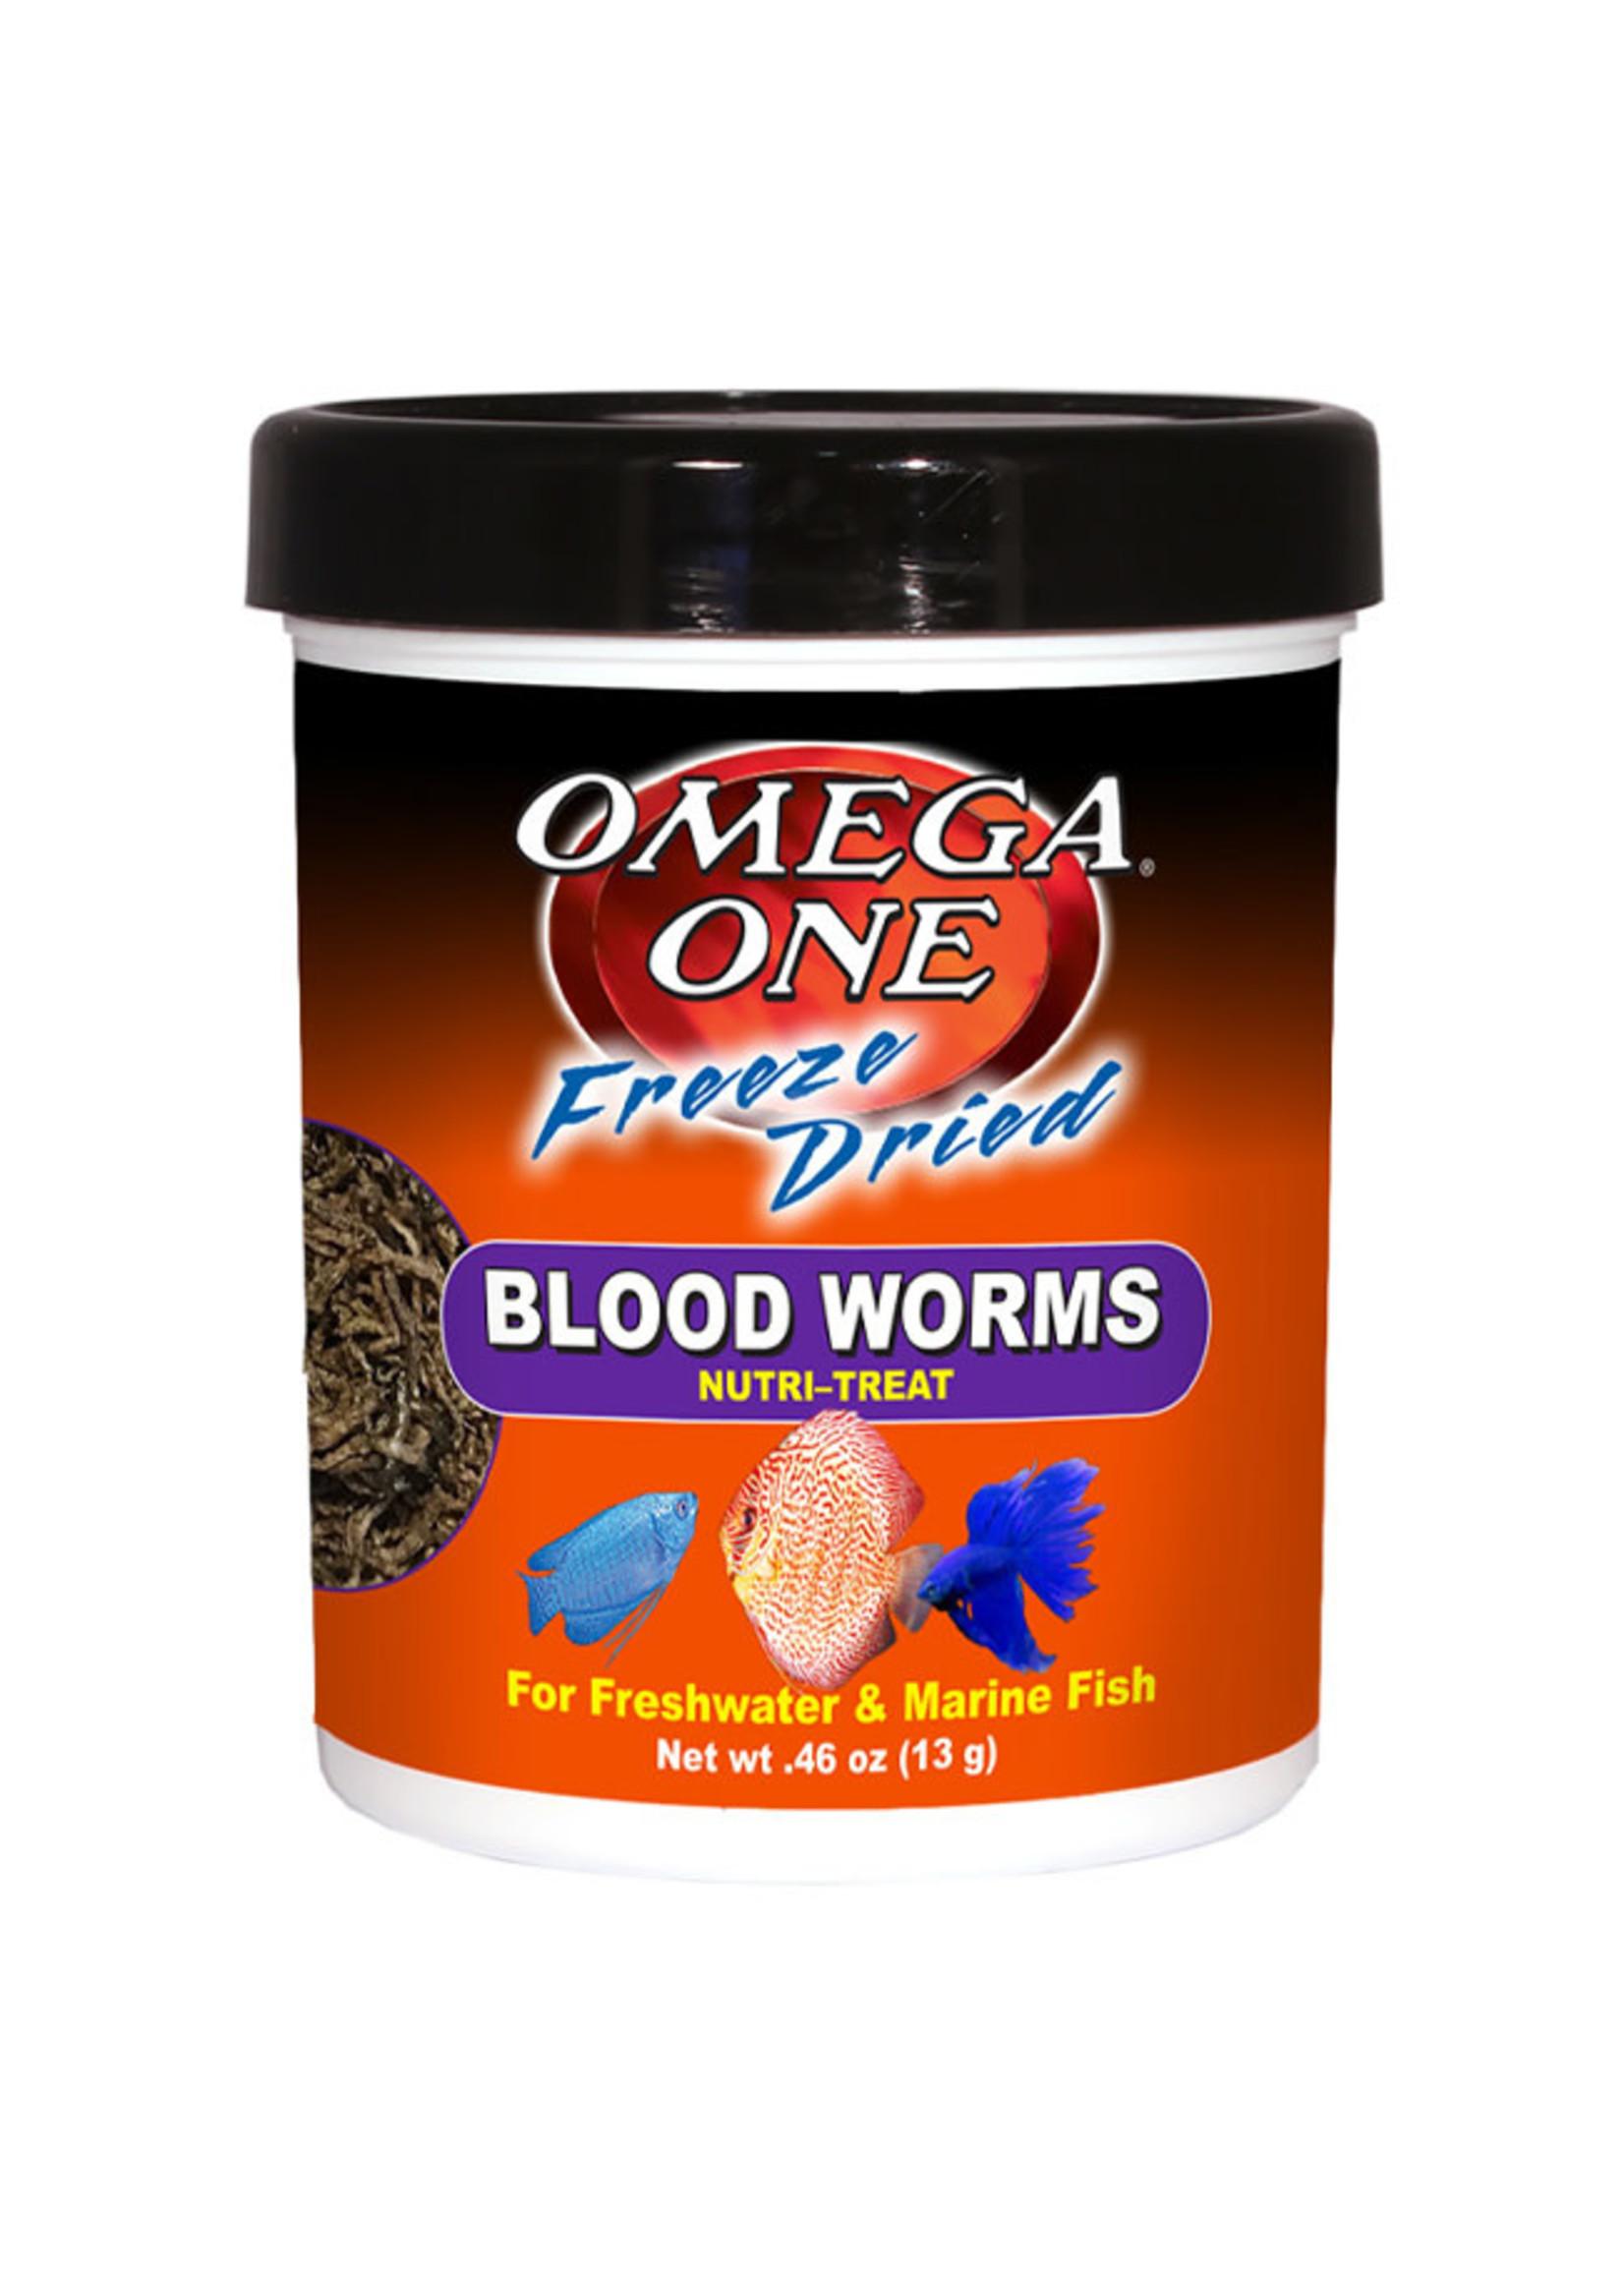 Omega One Omega One Freeze Dried Blood Worms Nutri-Treat